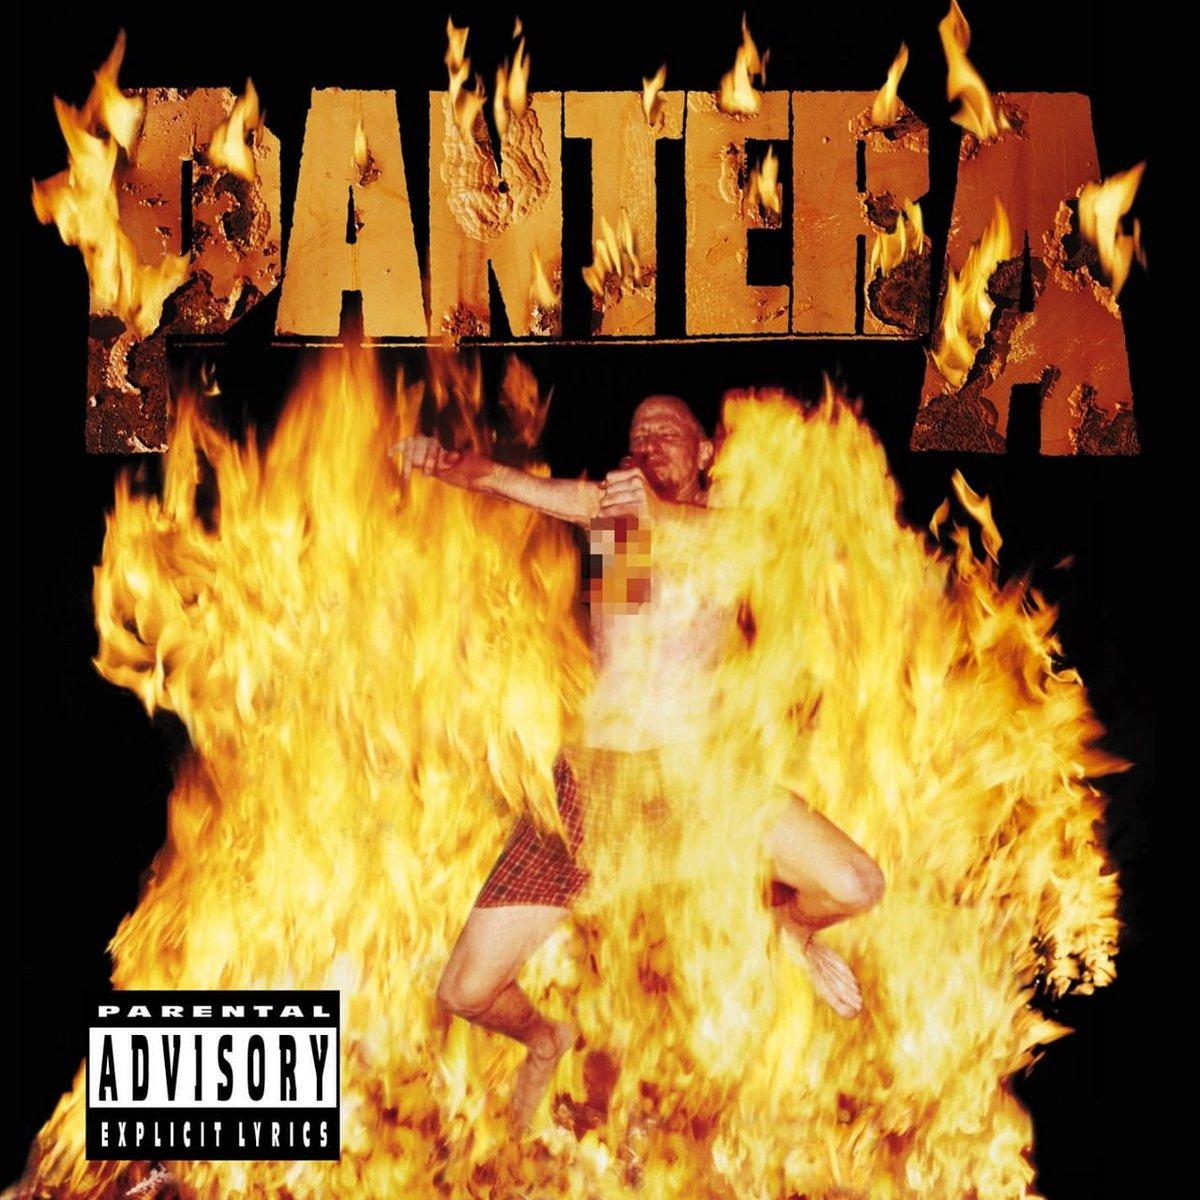 #NowPlaying: @Pantera - Reinventing The Steel 🎶🎼🎵🎸🥁  RIP Dimebag Darrell 🎸 💐 RIP Vinnie Paul 🥁 💐 https://t.co/yKeoOJXBYn